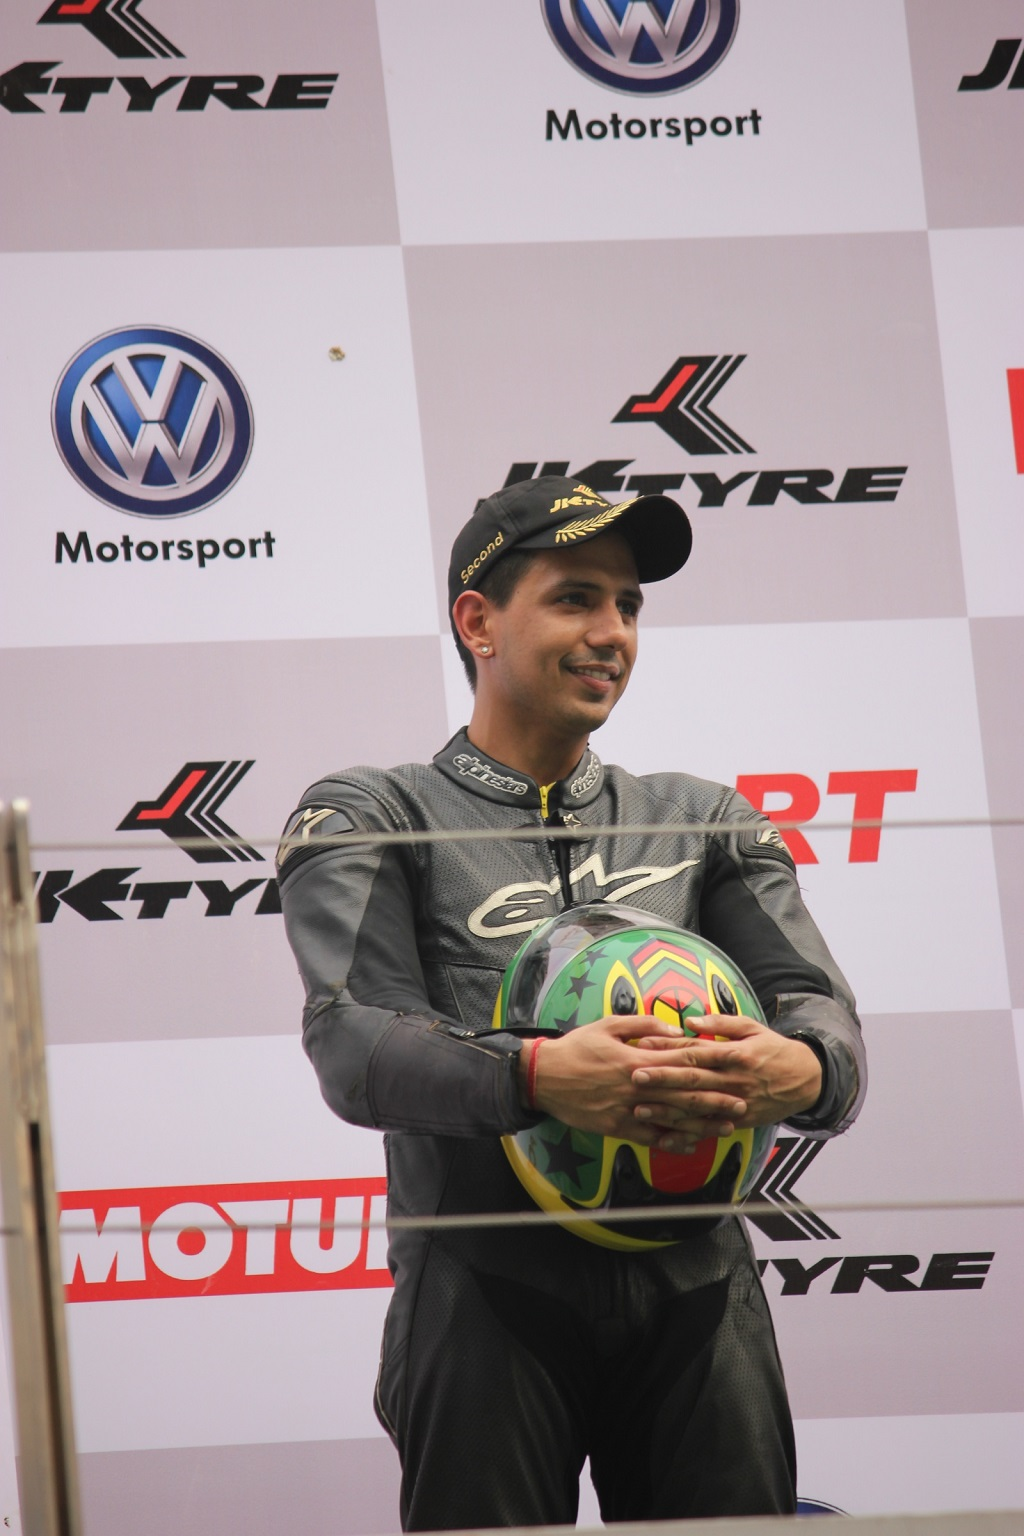 Vijay Singh, Winner of JK Tyres Racing Championship 2015